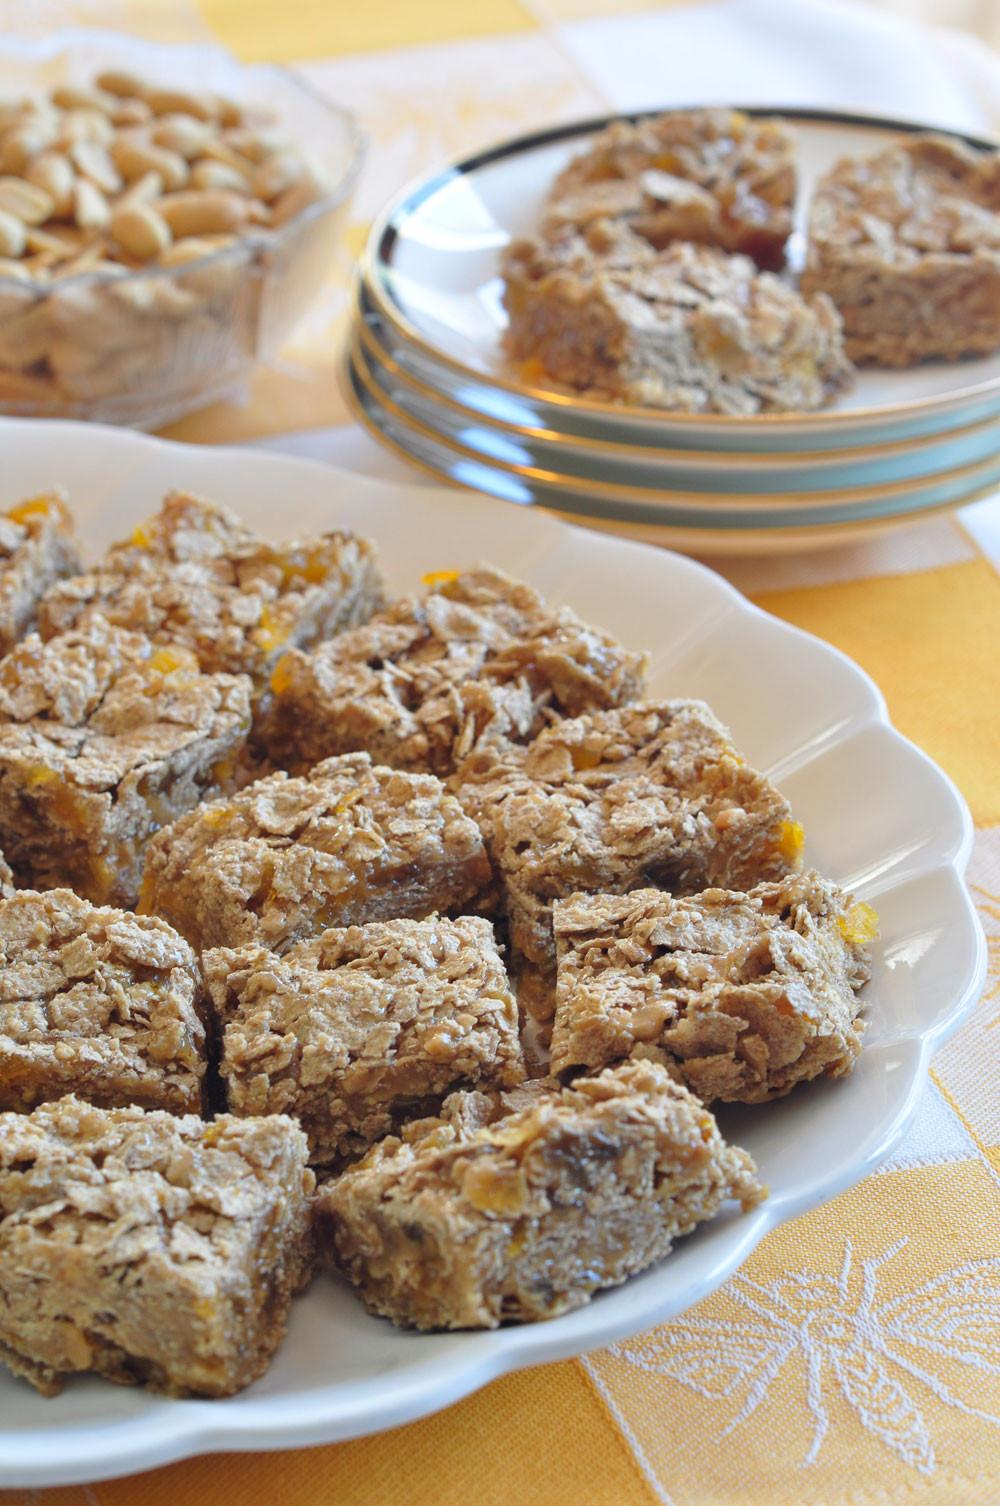 Breakfast Bar Recipes  Peanut Butter Sesame Breakfast Bars Recipe — Dishmaps